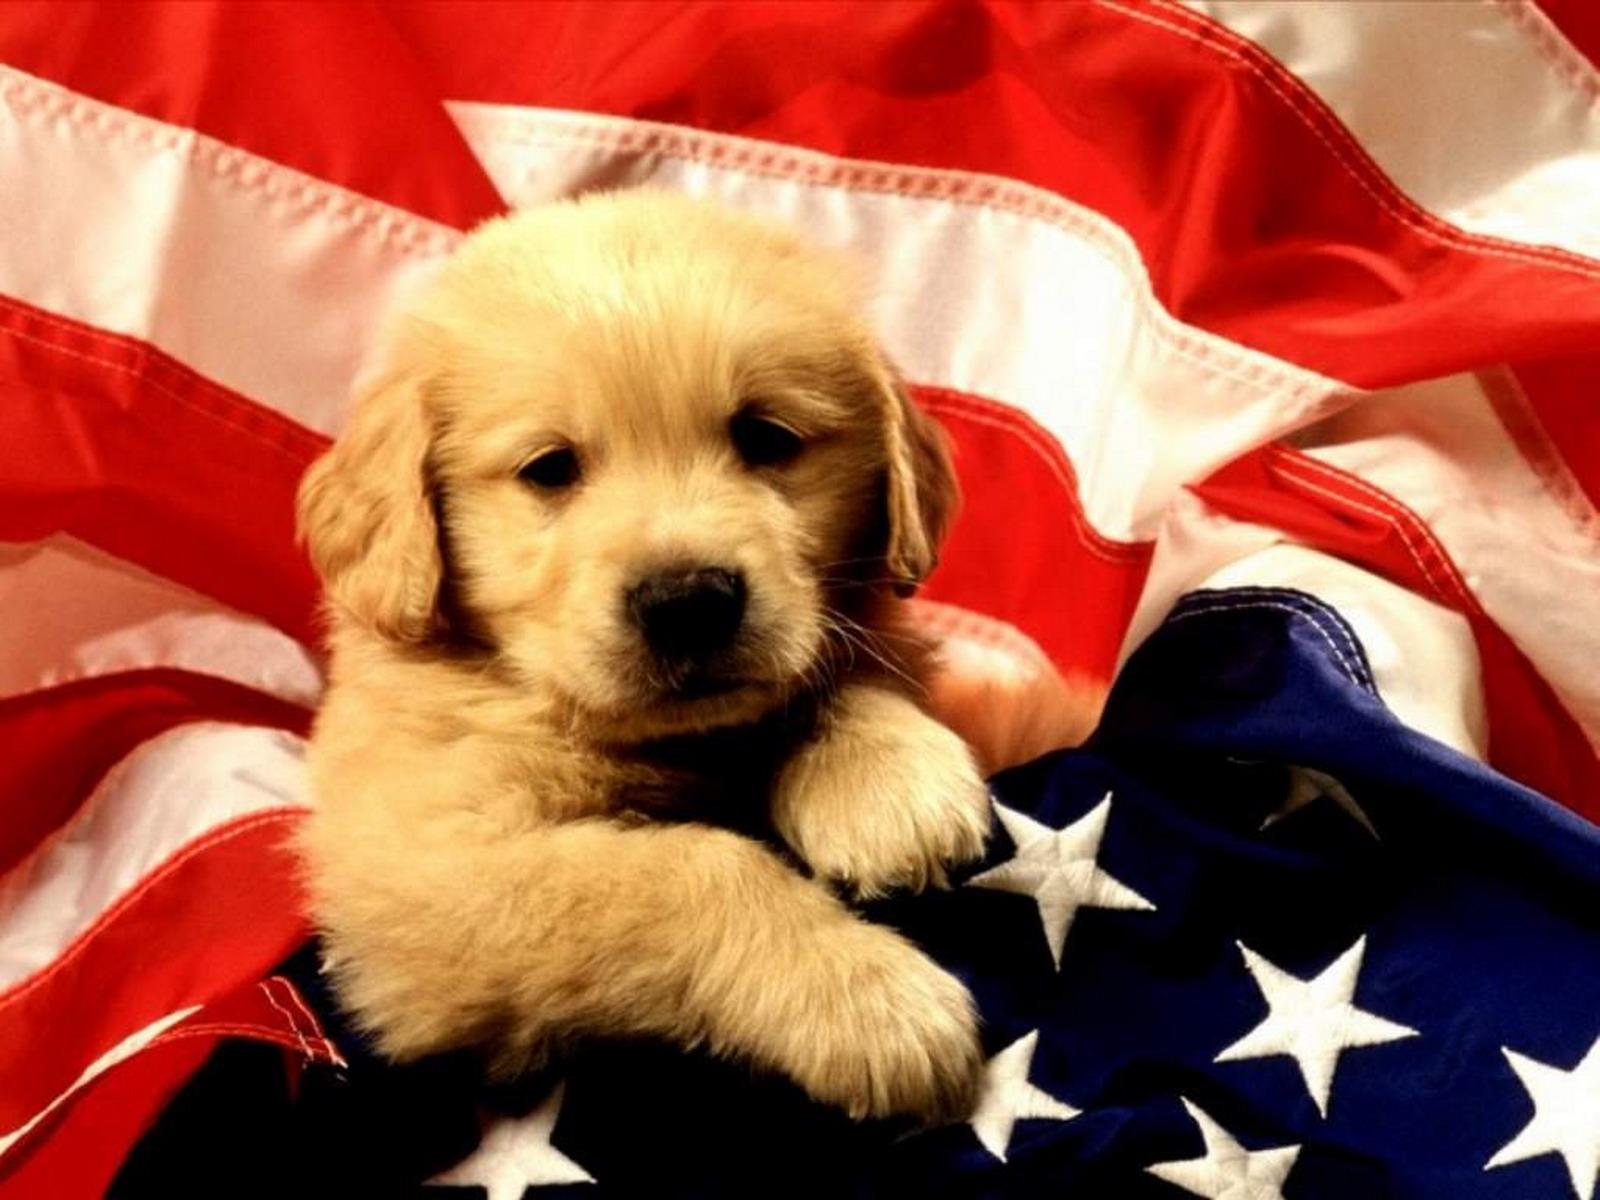 http://2.bp.blogspot.com/-dFDou1xtQjo/Tcv_sduHb1I/AAAAAAAAM04/f9bXKEAPHdY/s1600/american%2Bbrown%2Bdog.jpg